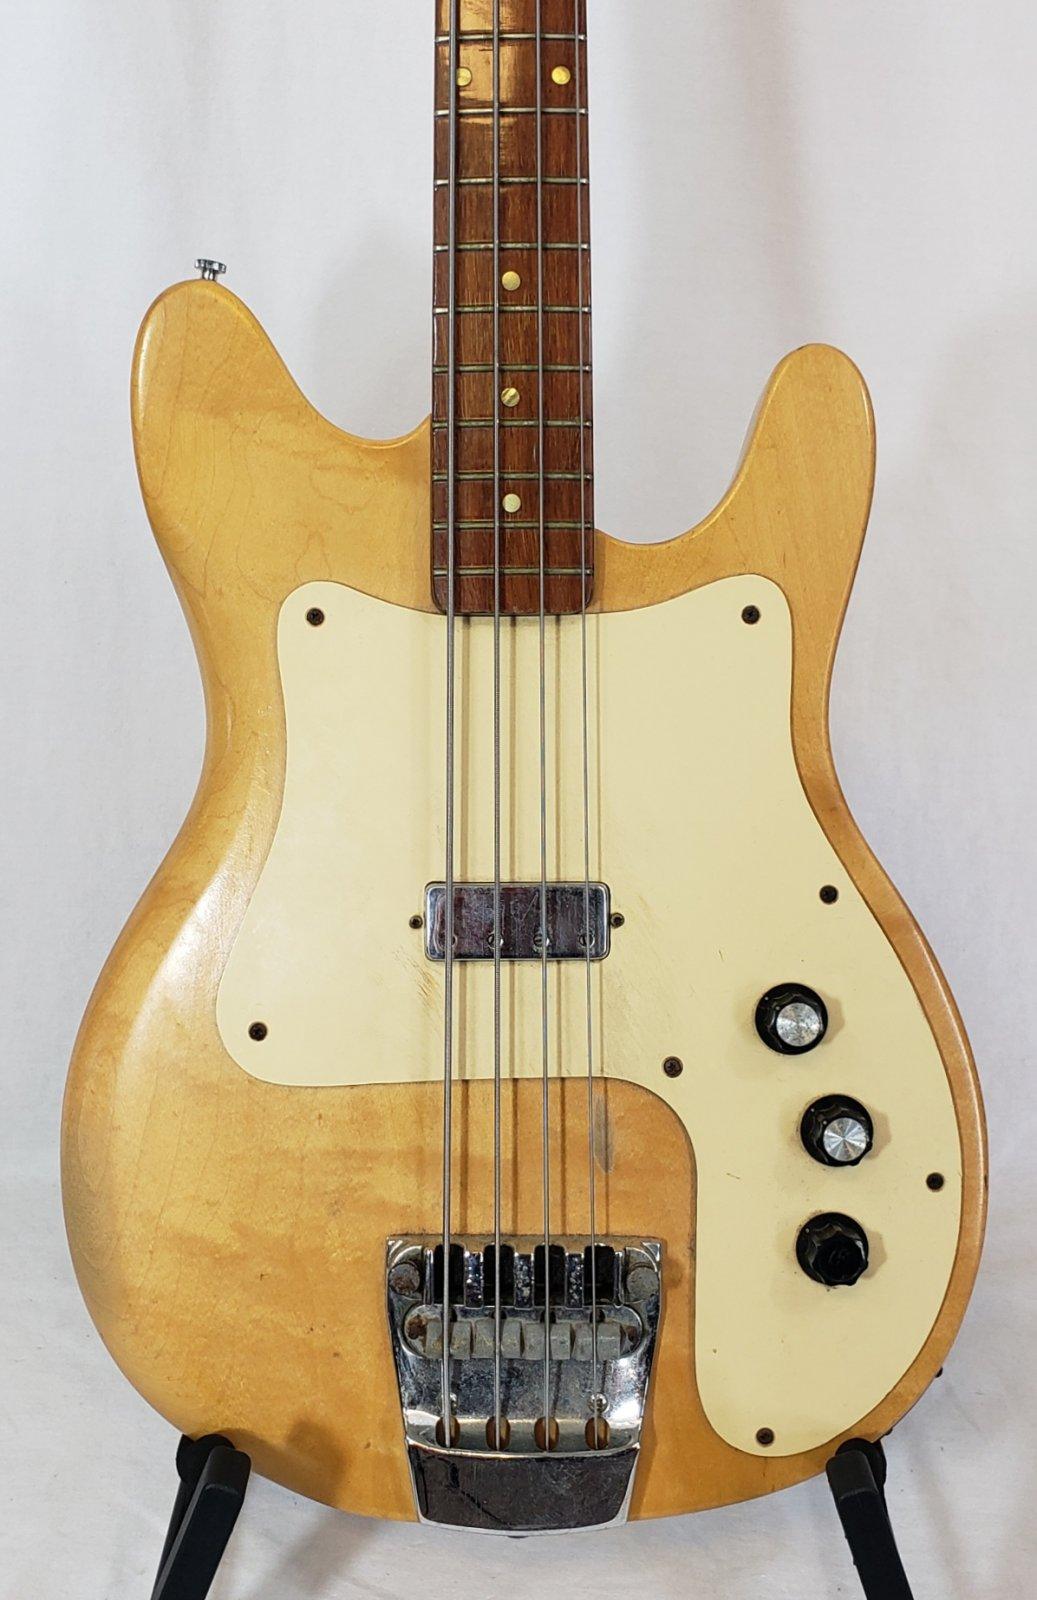 RICKENBAKER 3001 ELECTRIC BASS W CASE, 1978, NATURAL